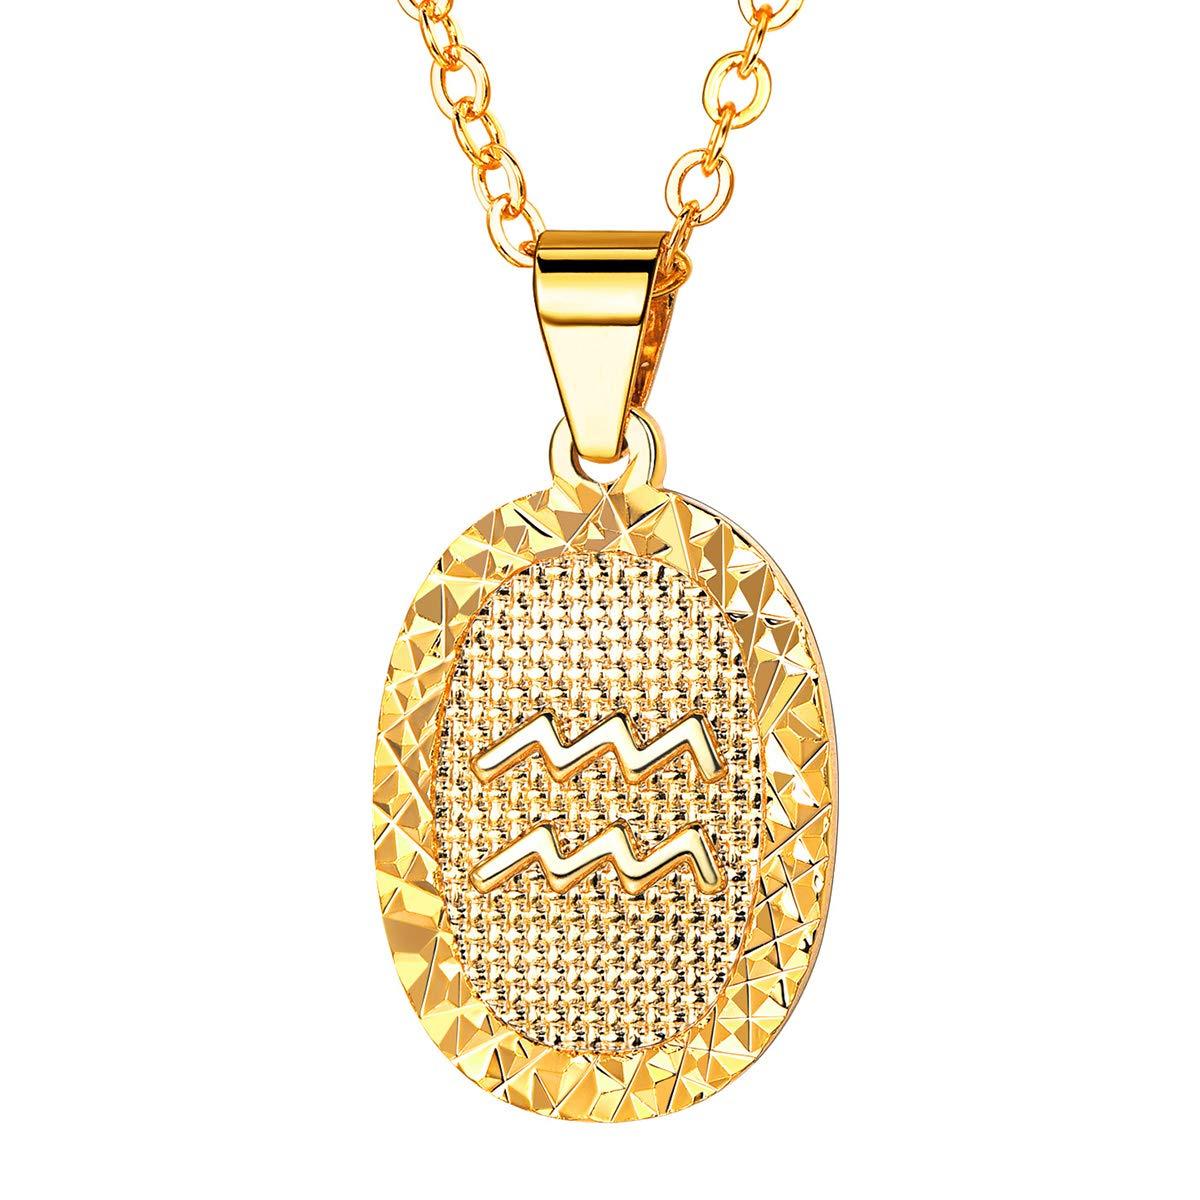 f19098971 Amazon.com: FOCALOOK Women Zodiac Sign Aquarius Jewelry 18k Gold Plated  Oval Constellation Horoscope Pendant Necklace Birthday Gift: Jewelry